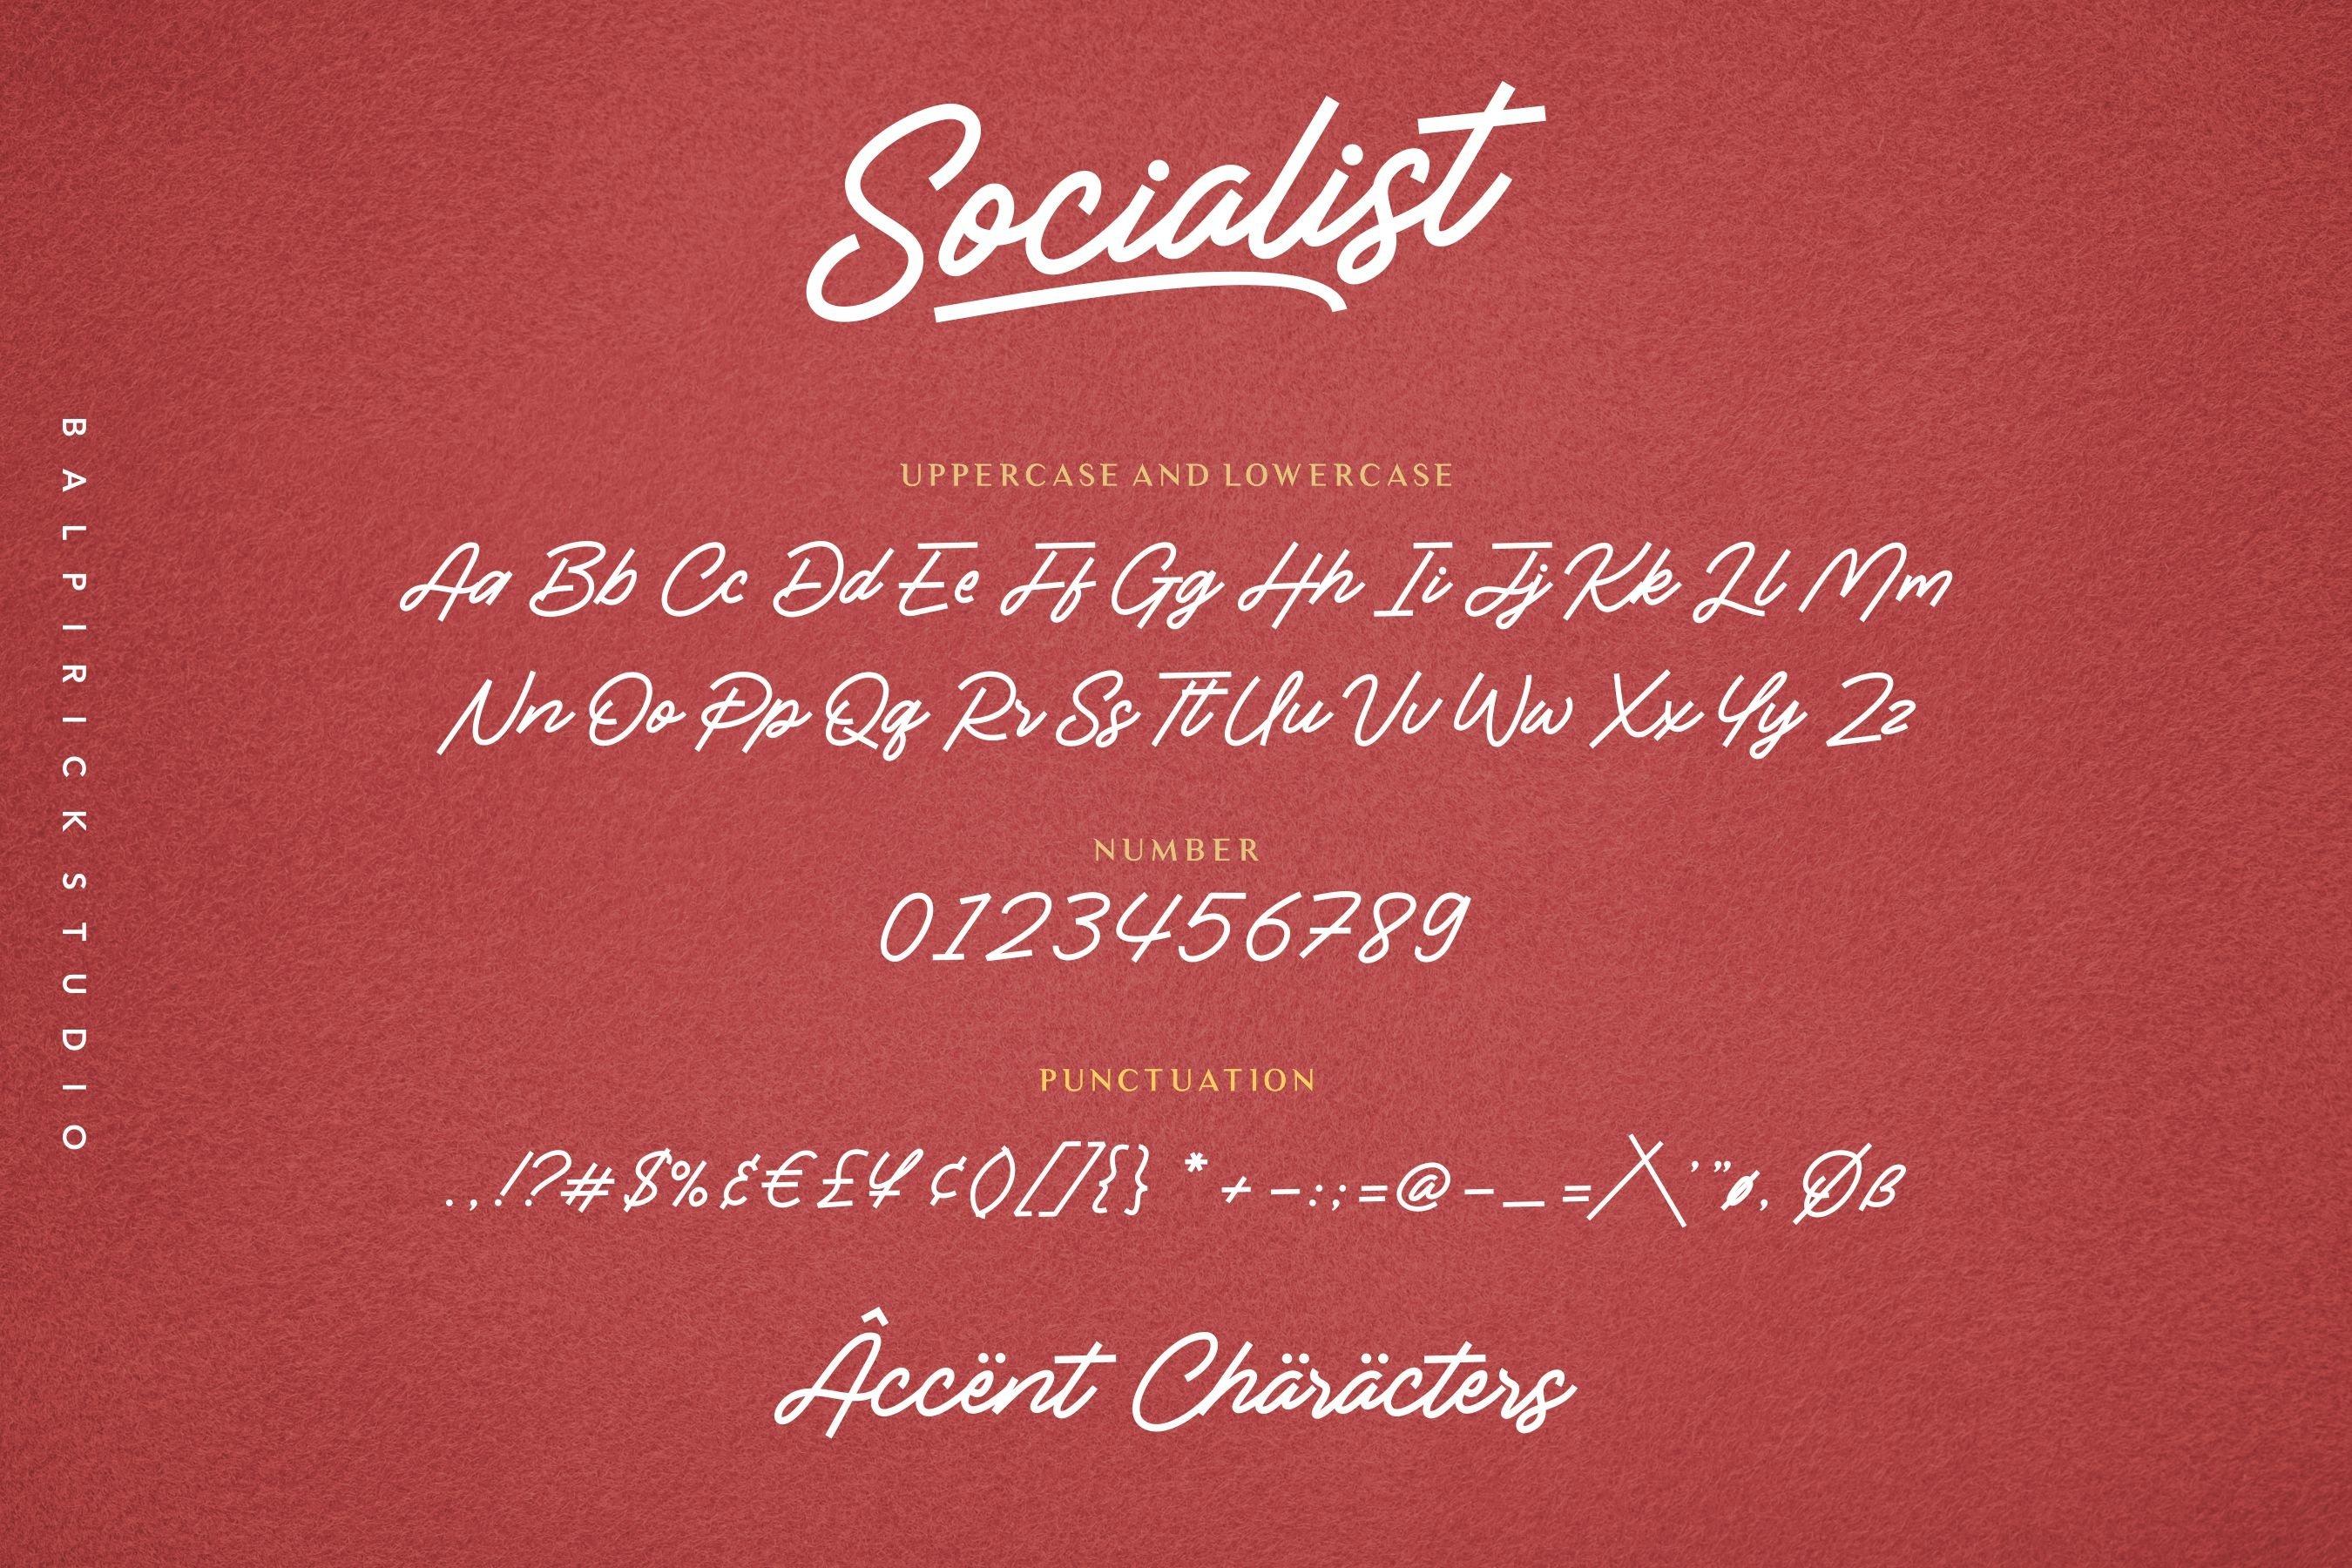 Socialist a Casual Monoline Font example image 6